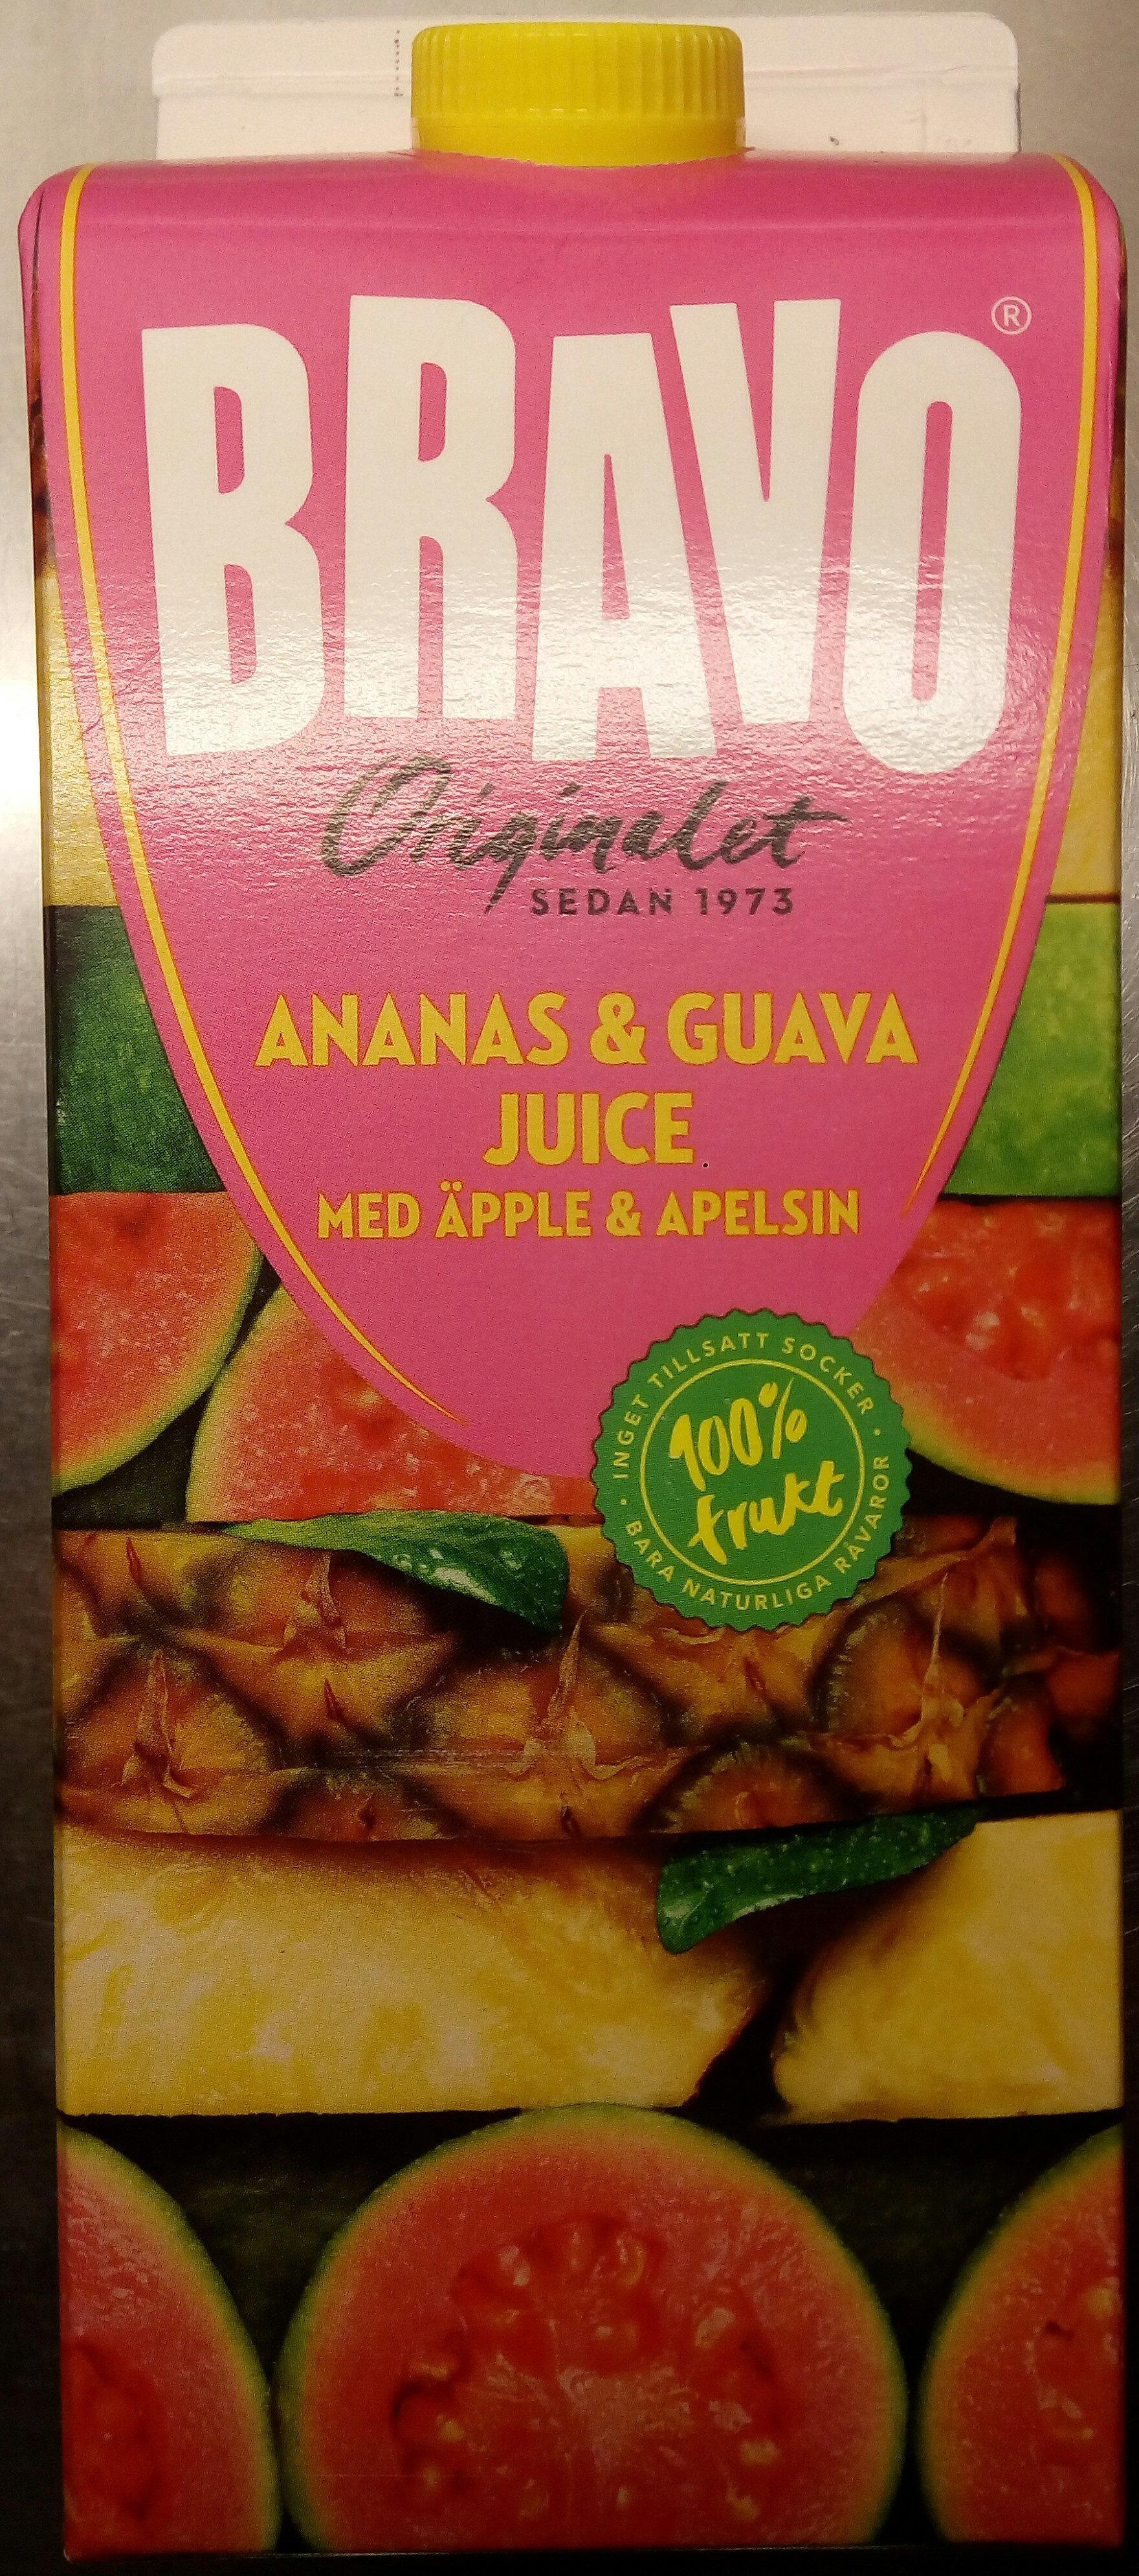 Bravo Ananas & Guavajuice med äpple & apelsin - Produit - sv